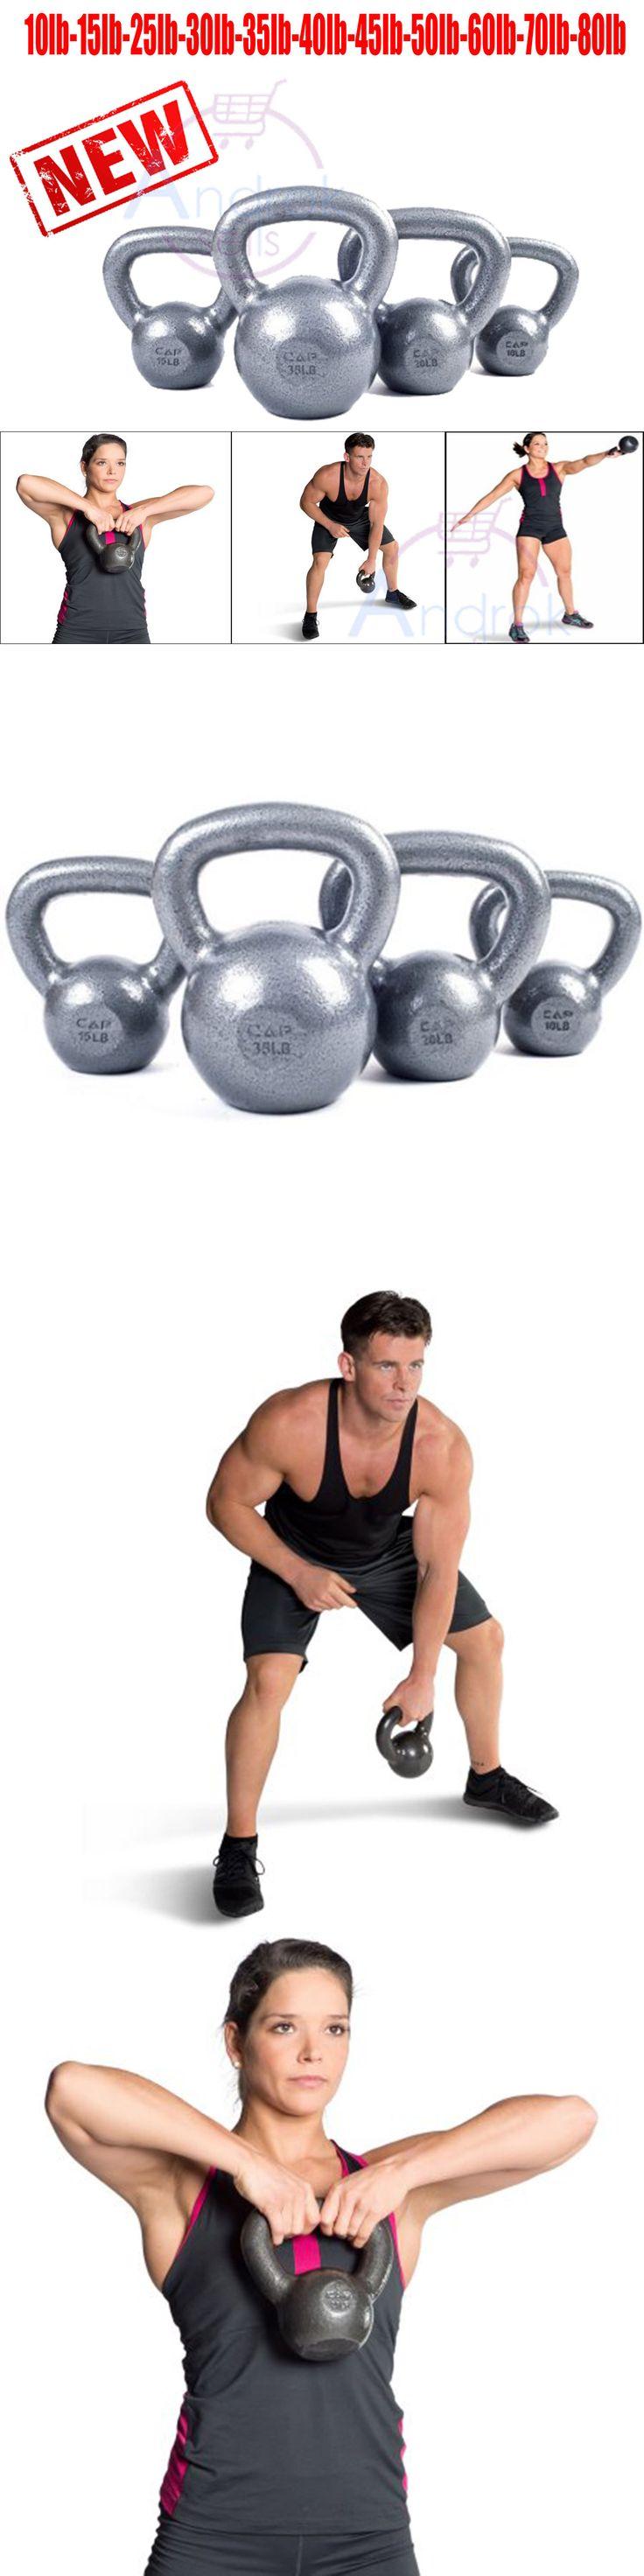 Kettlebells 179814: Cap Barbell Kettlebell Cast Iron Weight Lift Workout Gym Fitness Hand Olympic -> BUY IT NOW ONLY: $59.99 on eBay! https://www.kettlebellmaniac.com/shop/